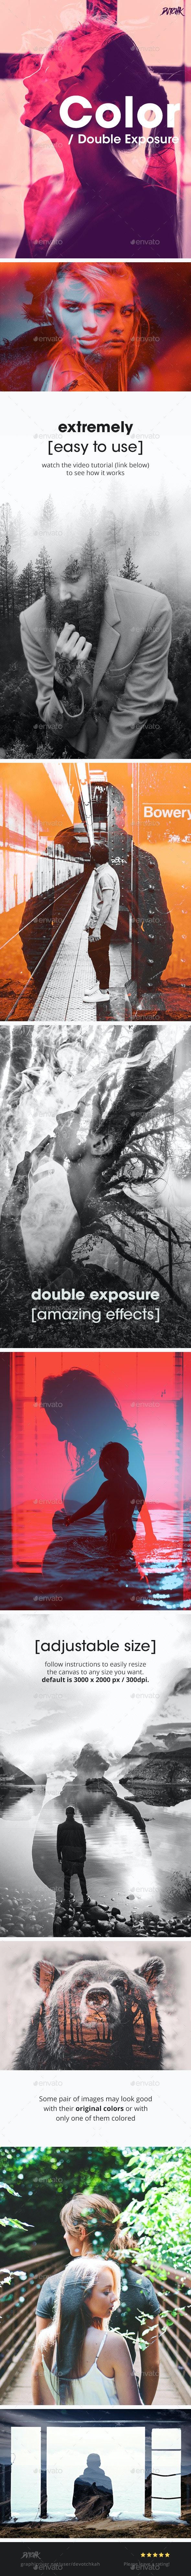 Color - Double Exposure Photoshop Photo Template